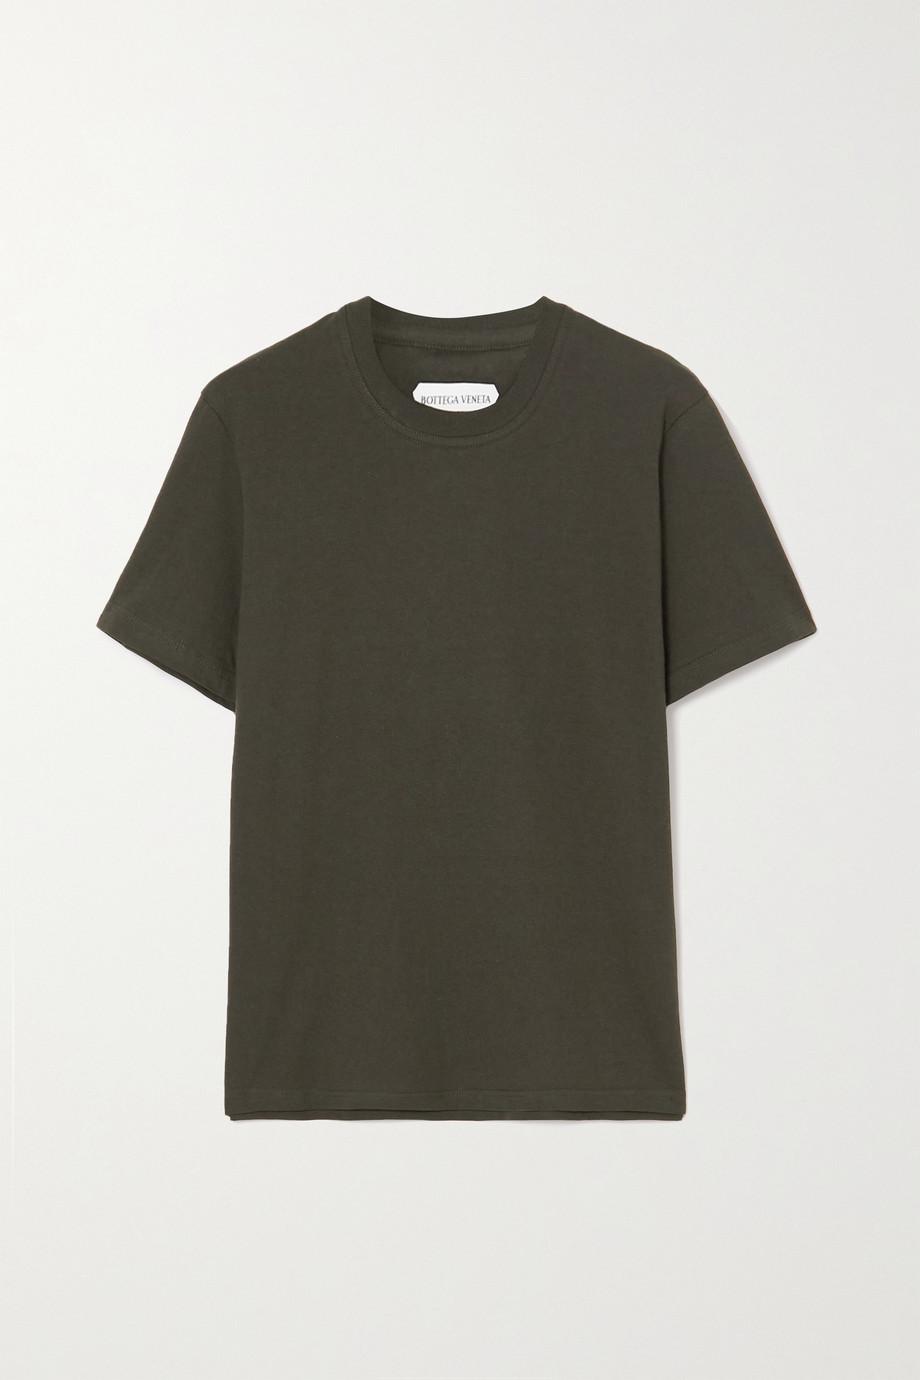 Bottega Veneta T-shirt en jersey de coton lavé